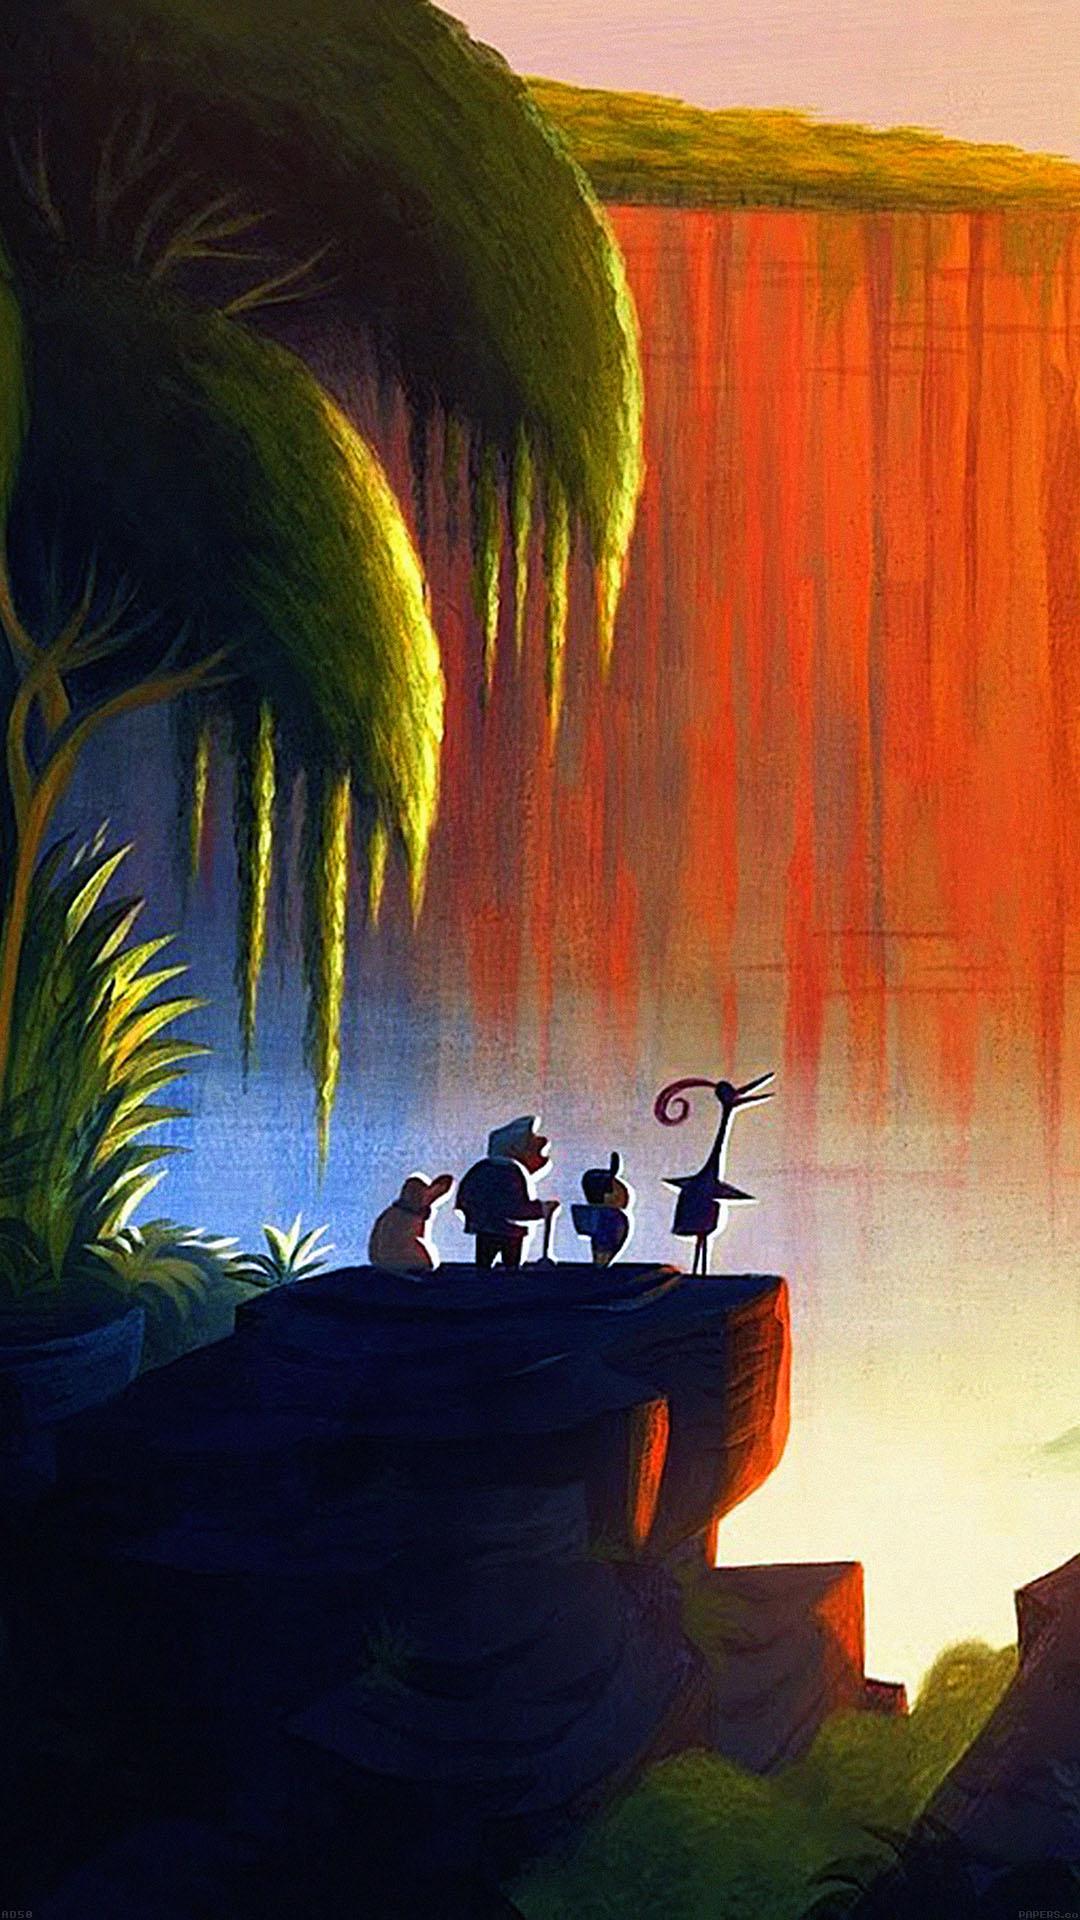 Ipad Wallpaper Disney